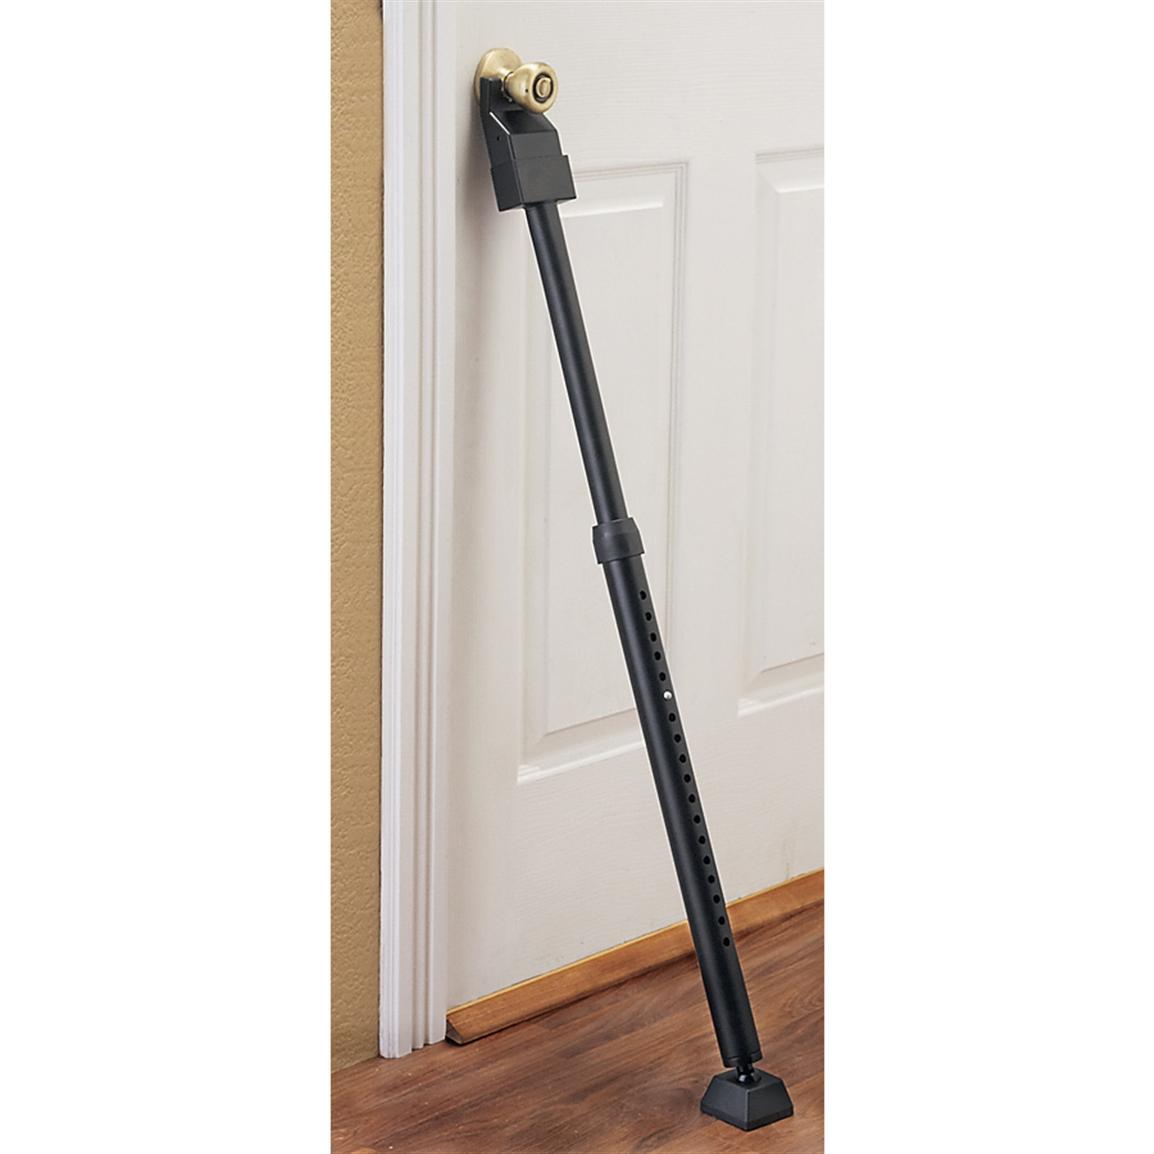 door knob security devices photo - 2